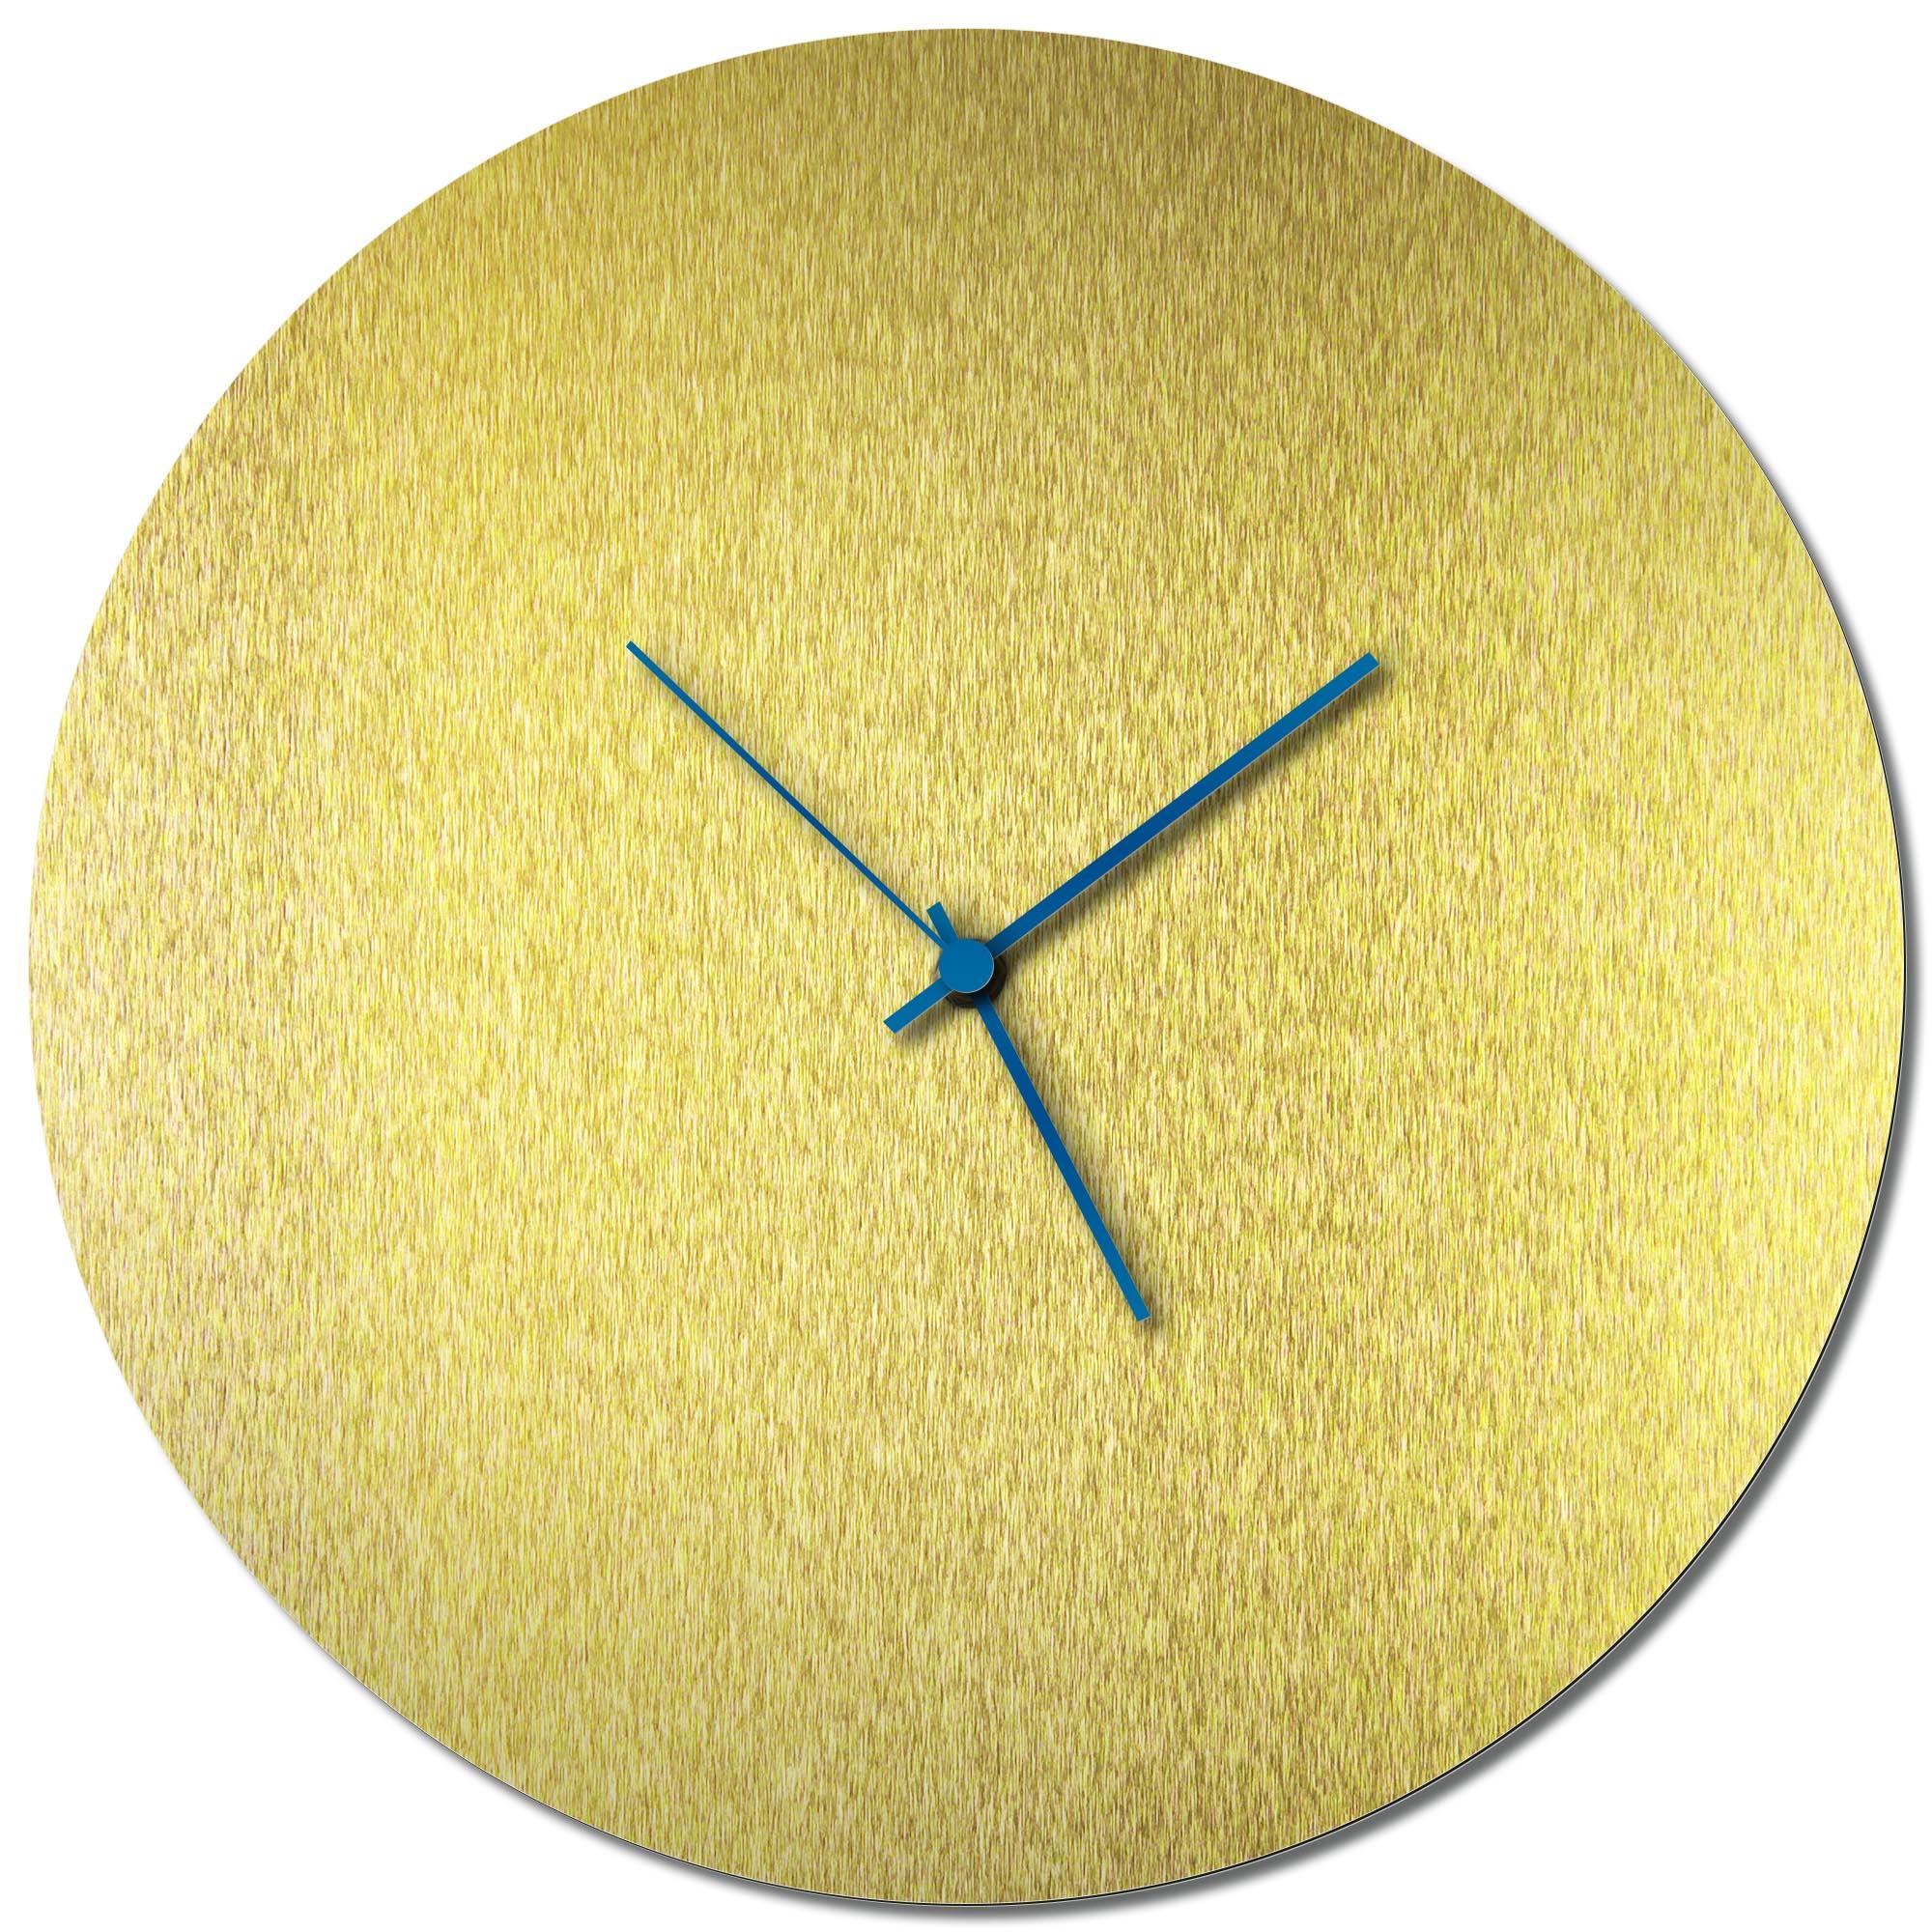 Adam Schwoeppe 'Goldsmith Circle Clock Large Blue' Midcentury Modern Style Wall Clock